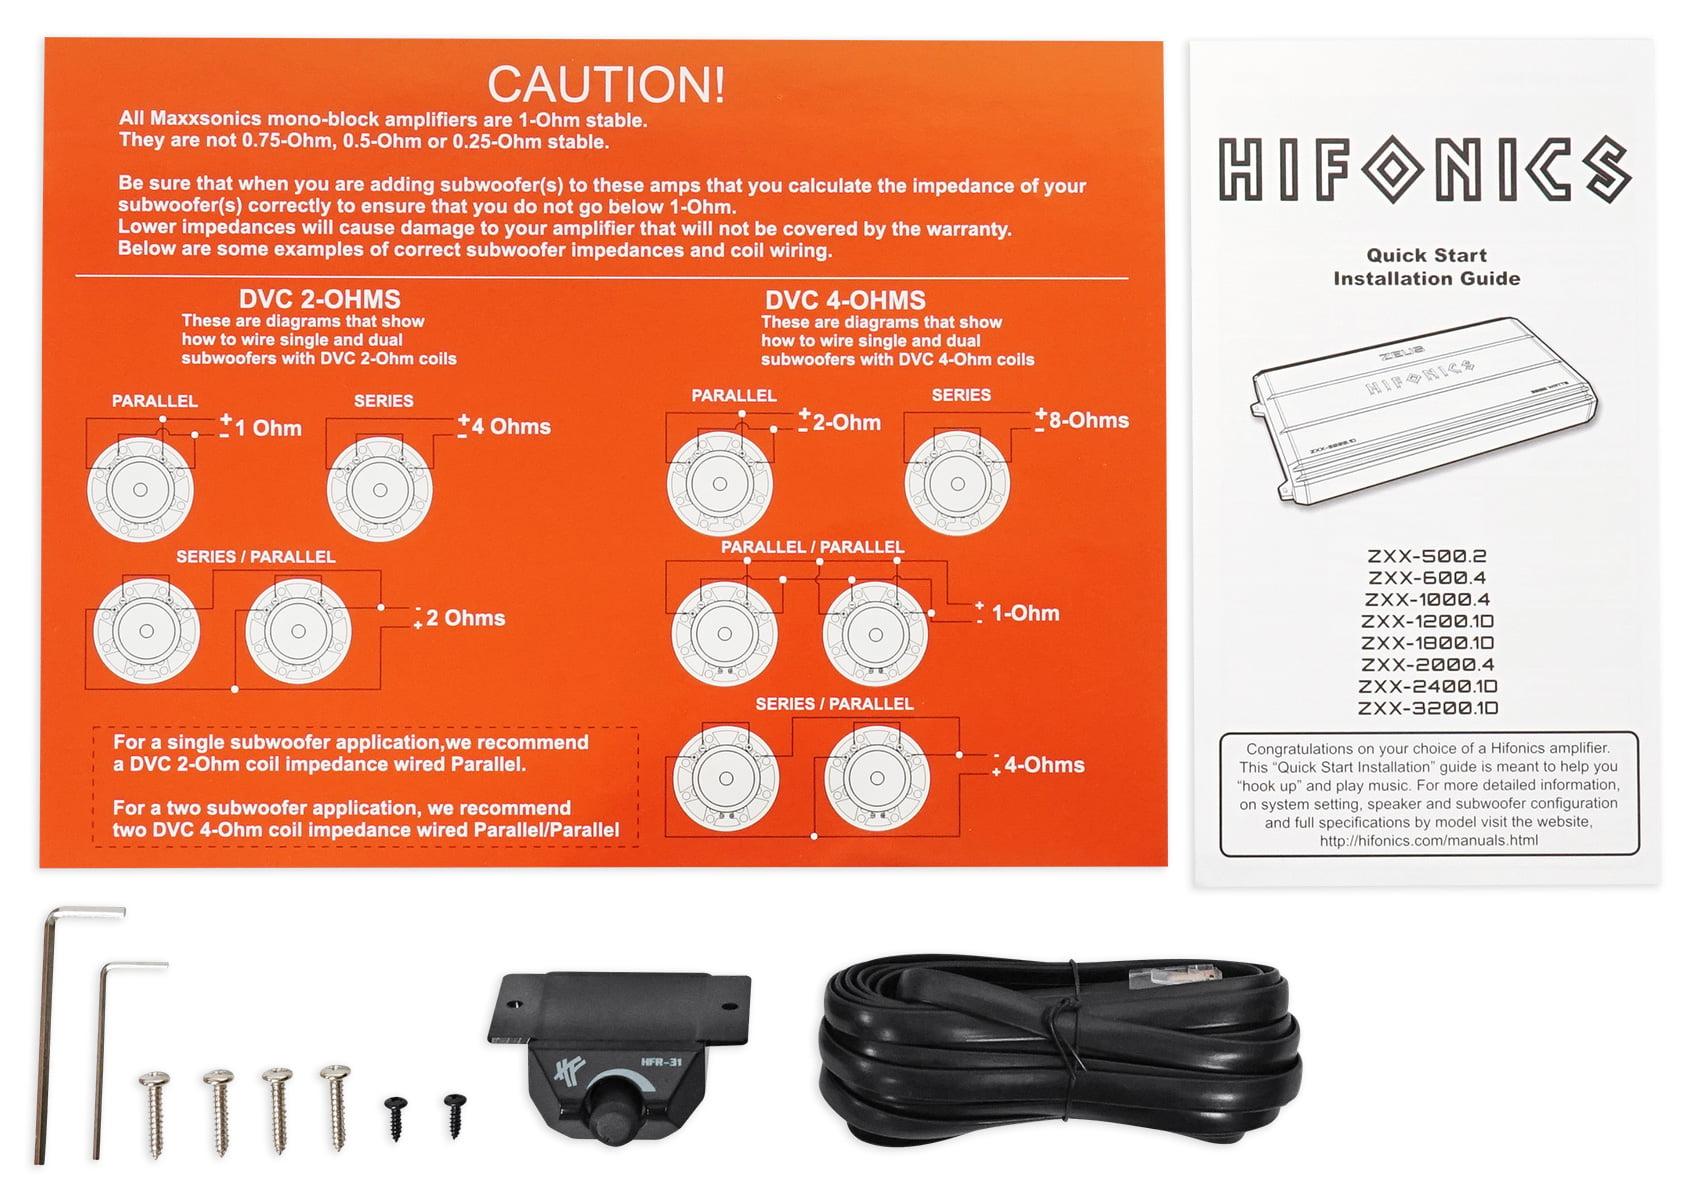 Hifonics Zeus Zxx 18001d 1800w Rms Mono Class D Car Audio Amplifier Wiring Diagram Amp Kit